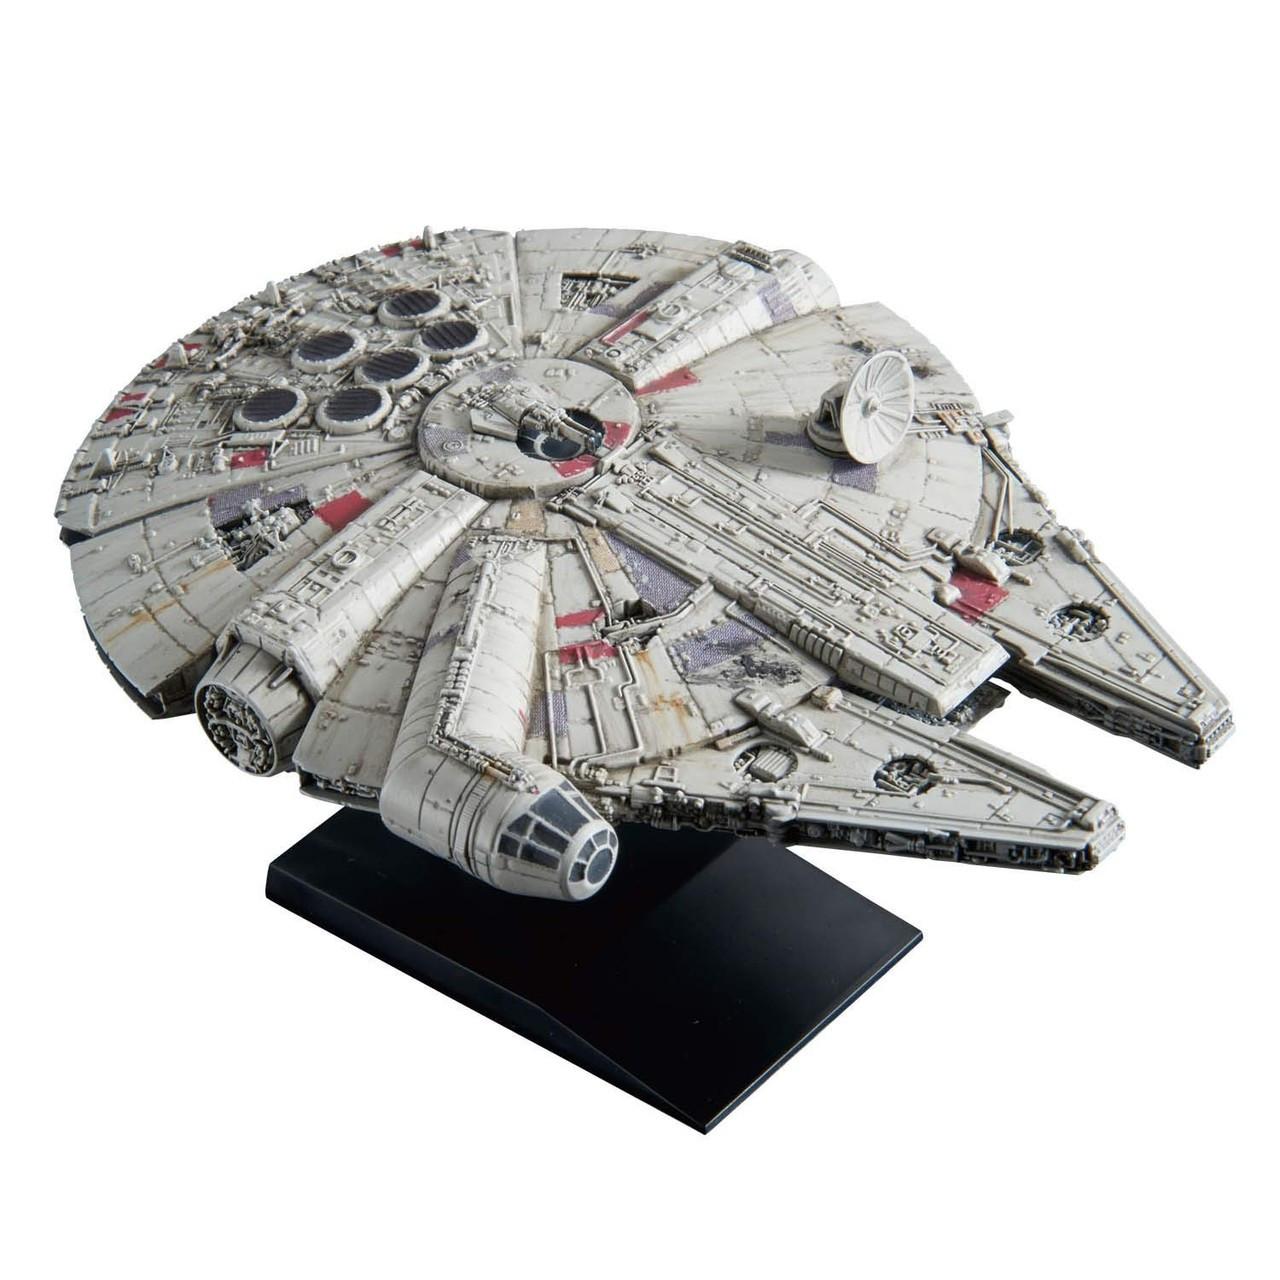 G Star wars TRADING CARD GAME Empire Strikes Back Millennium Falcon